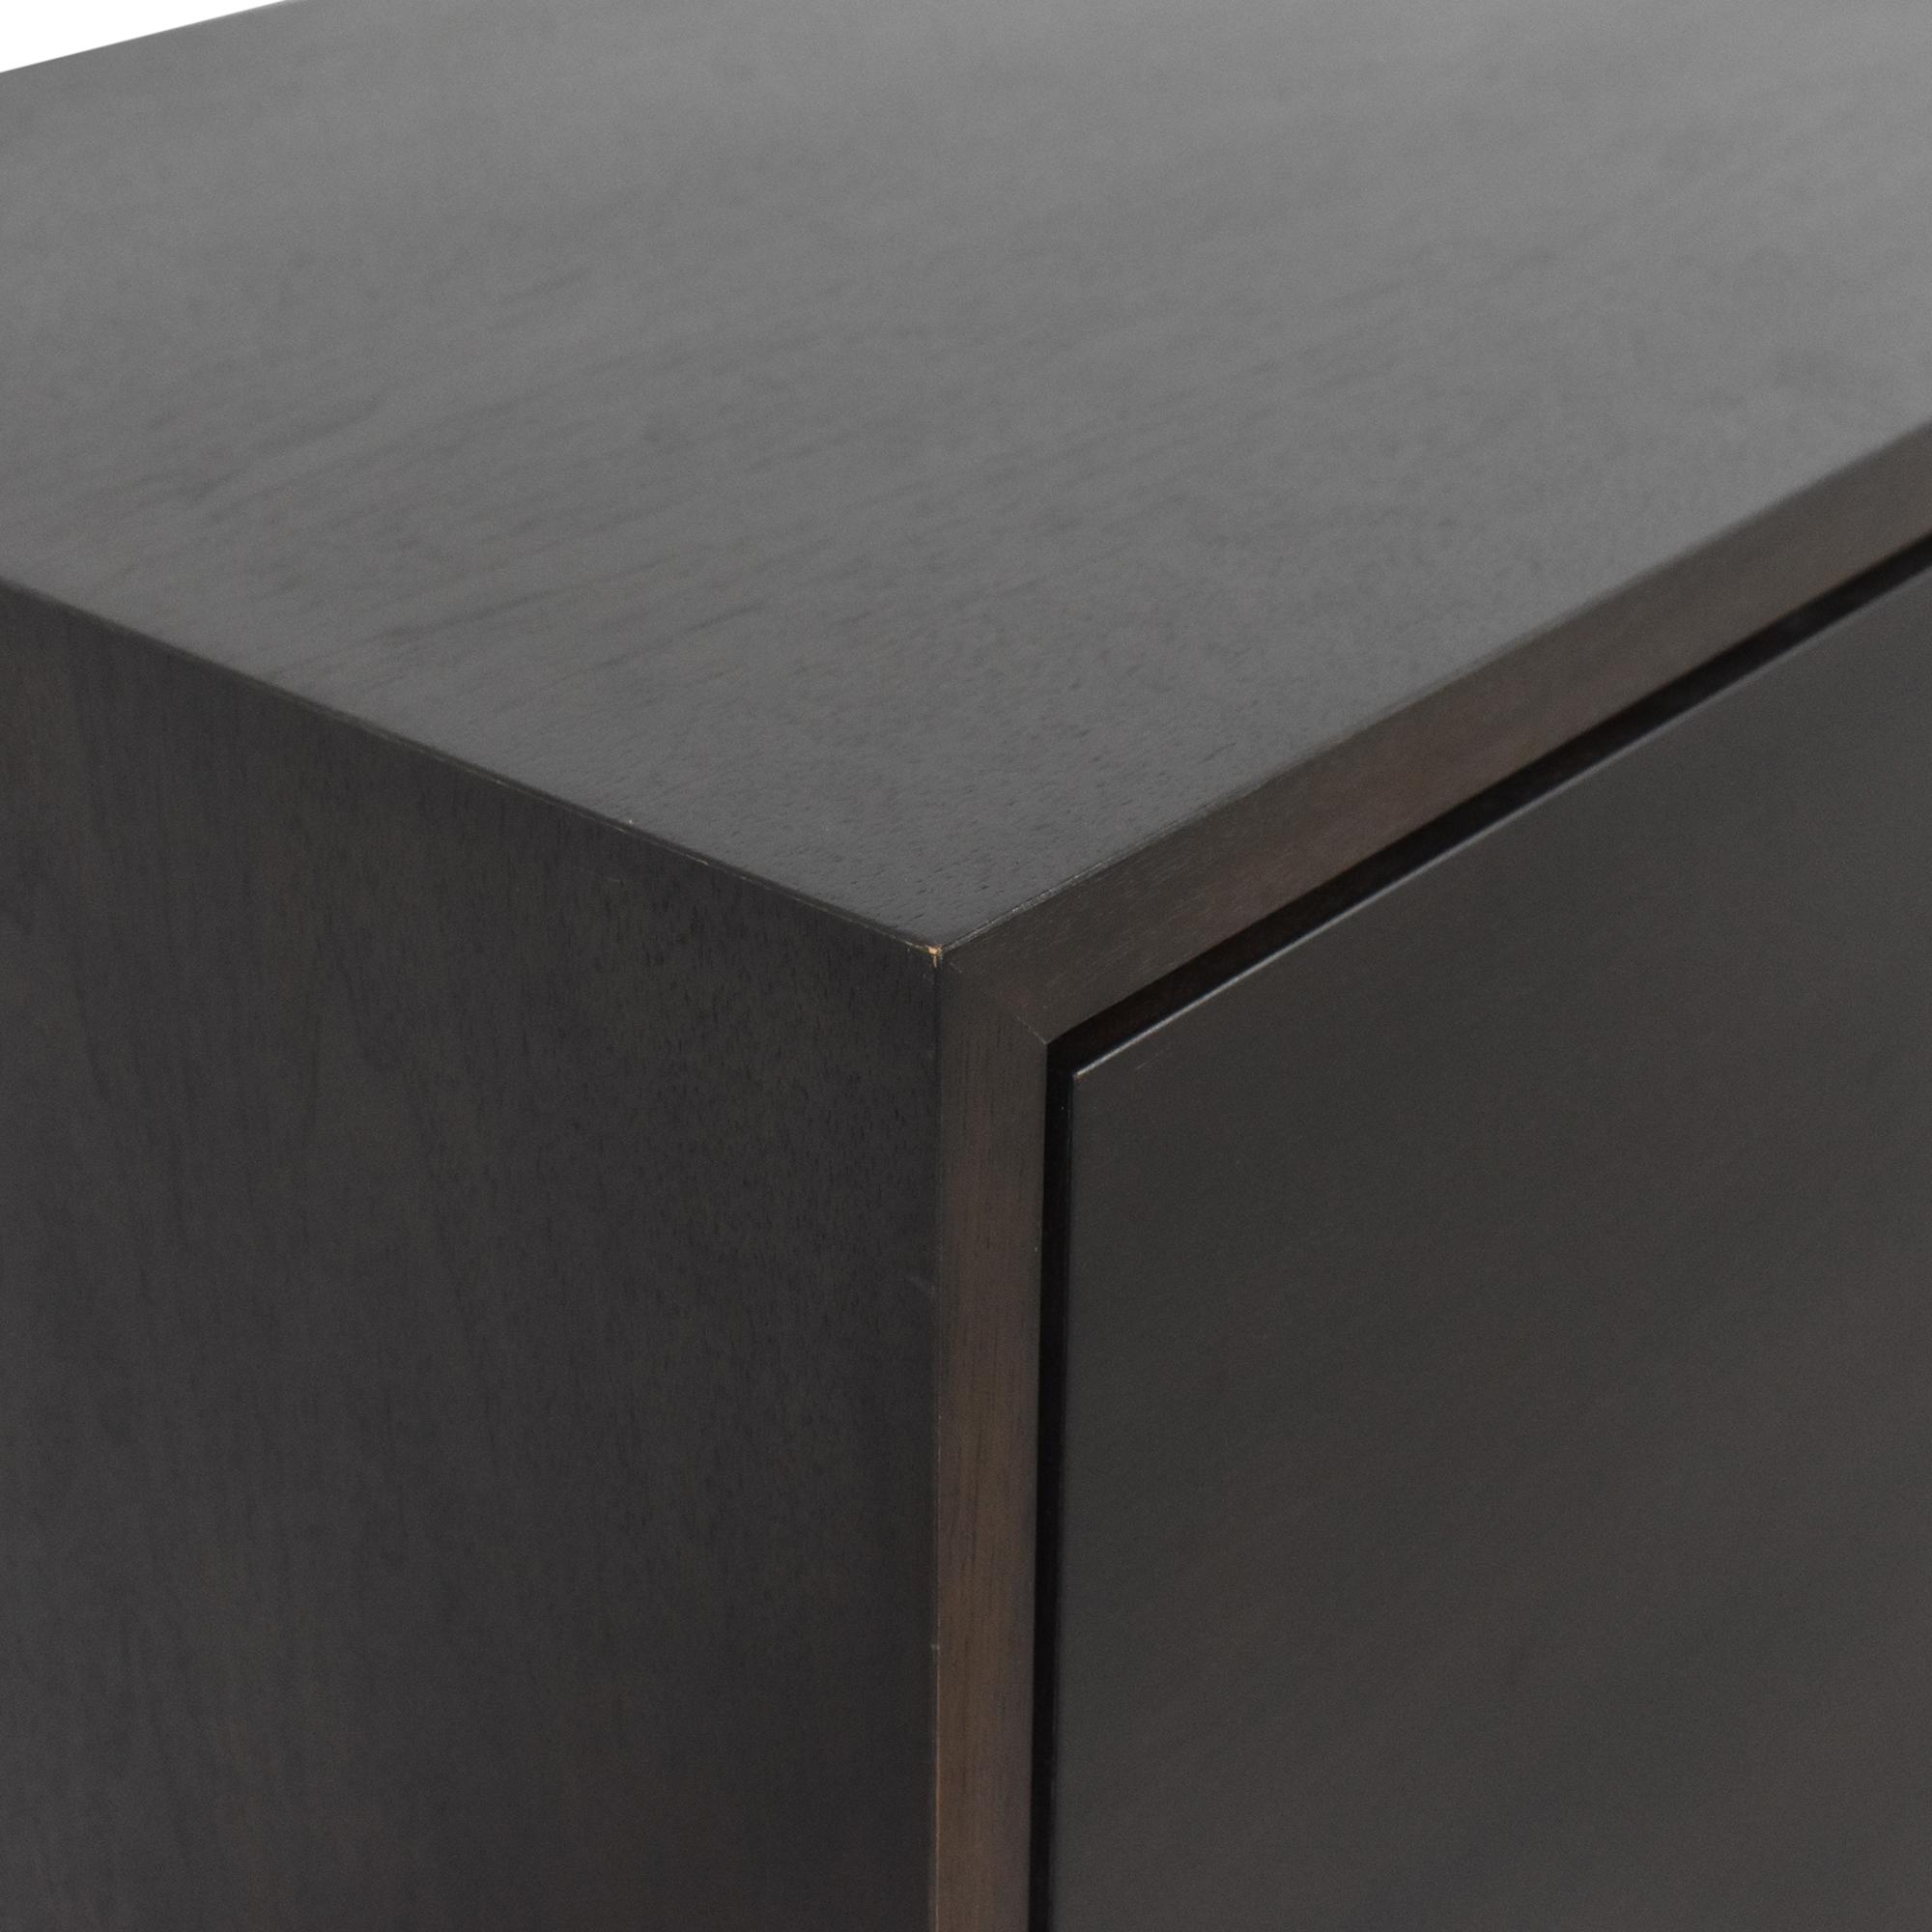 Domus Design Center Domus Design Center Low Modern Dresser ma